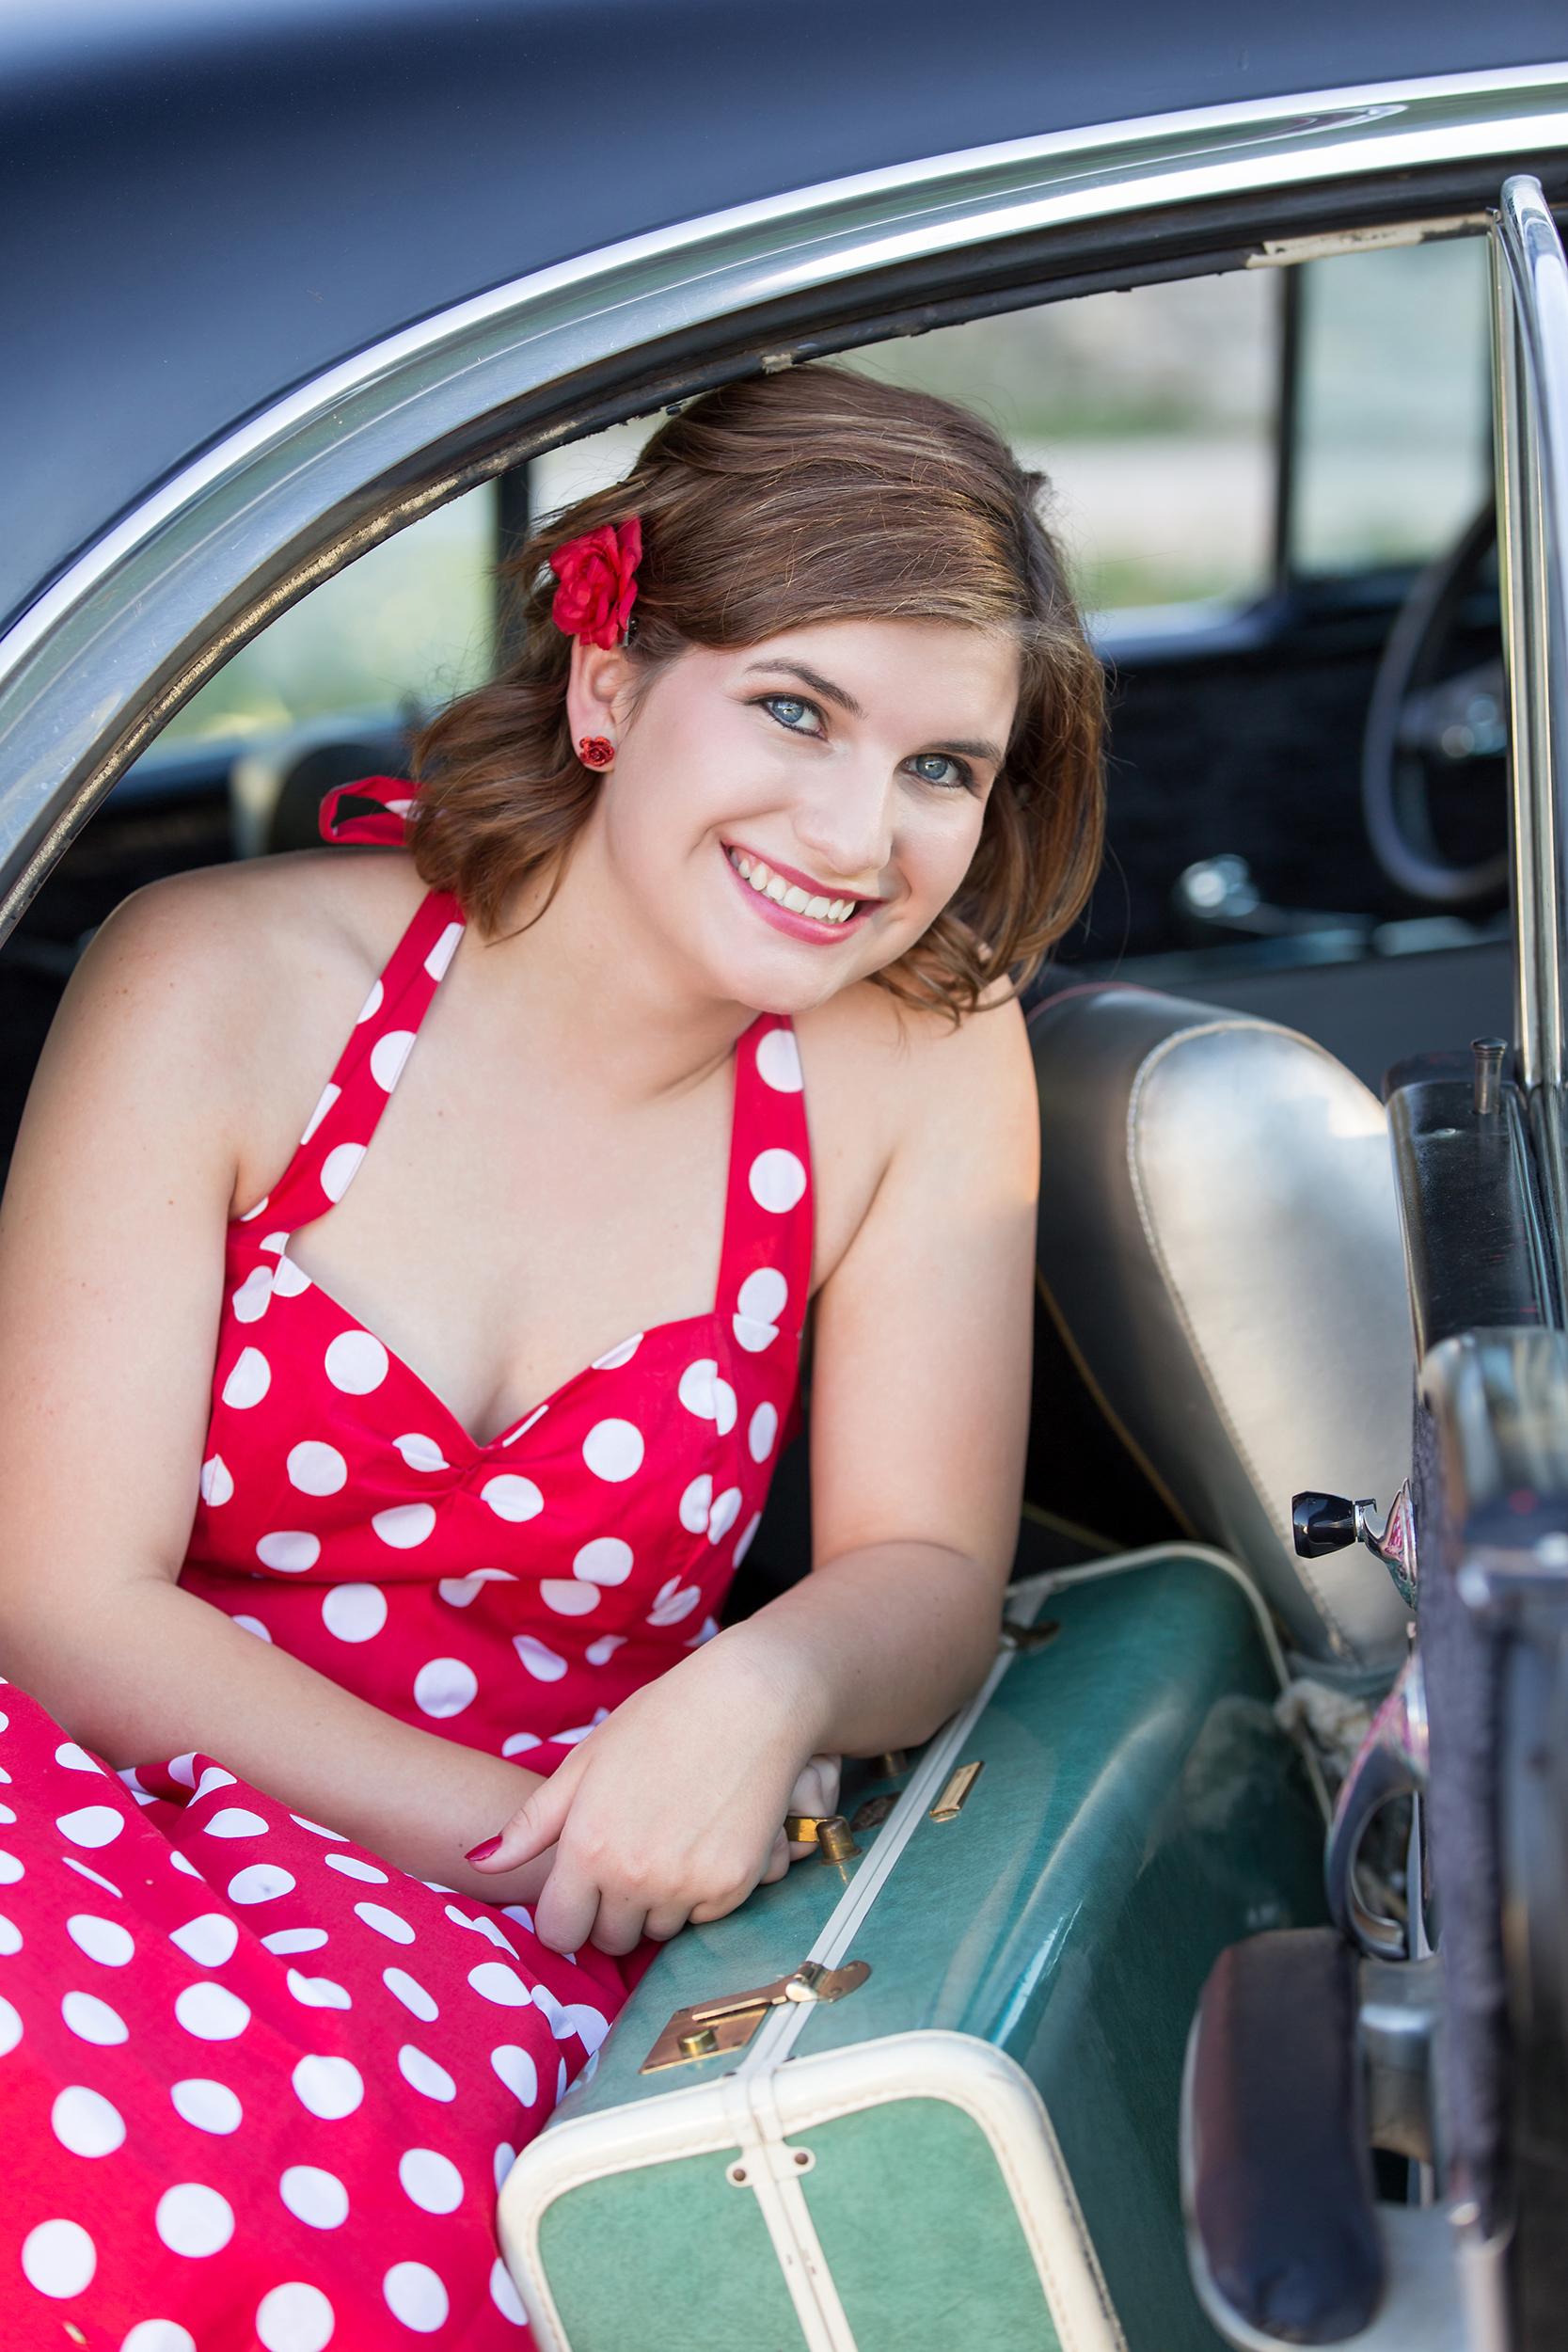 Senior-girl-vintage-car-suitcase-red-polkadot-dress.jpg